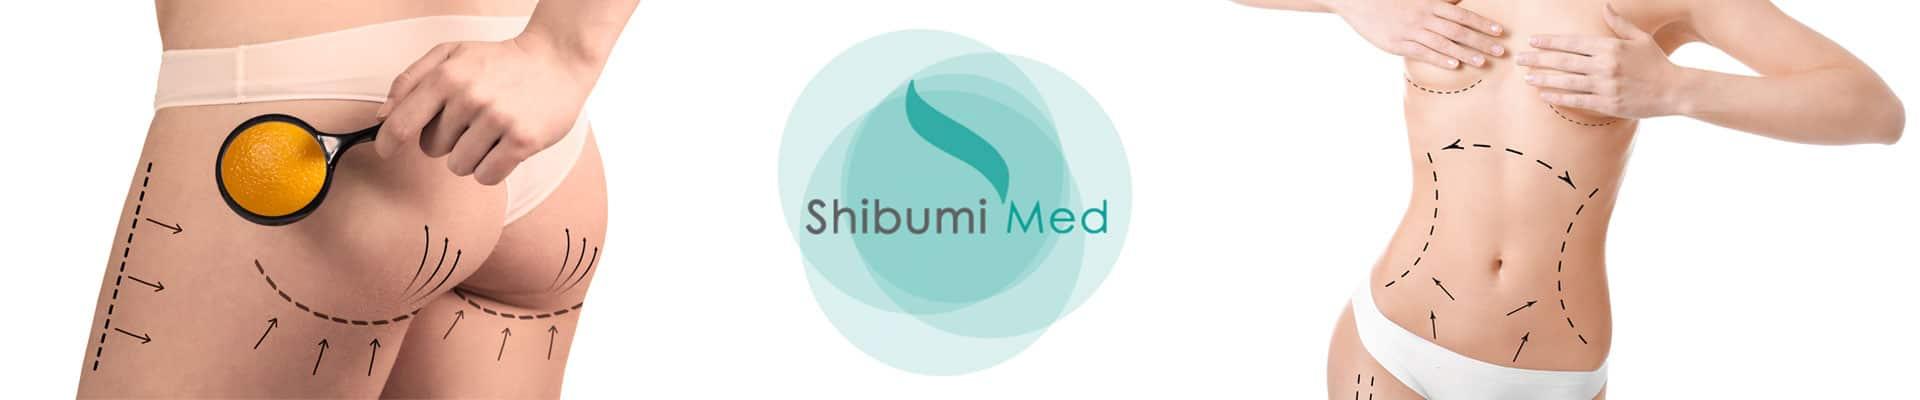 Medicina-Estetica-Torino-ShibumiMed